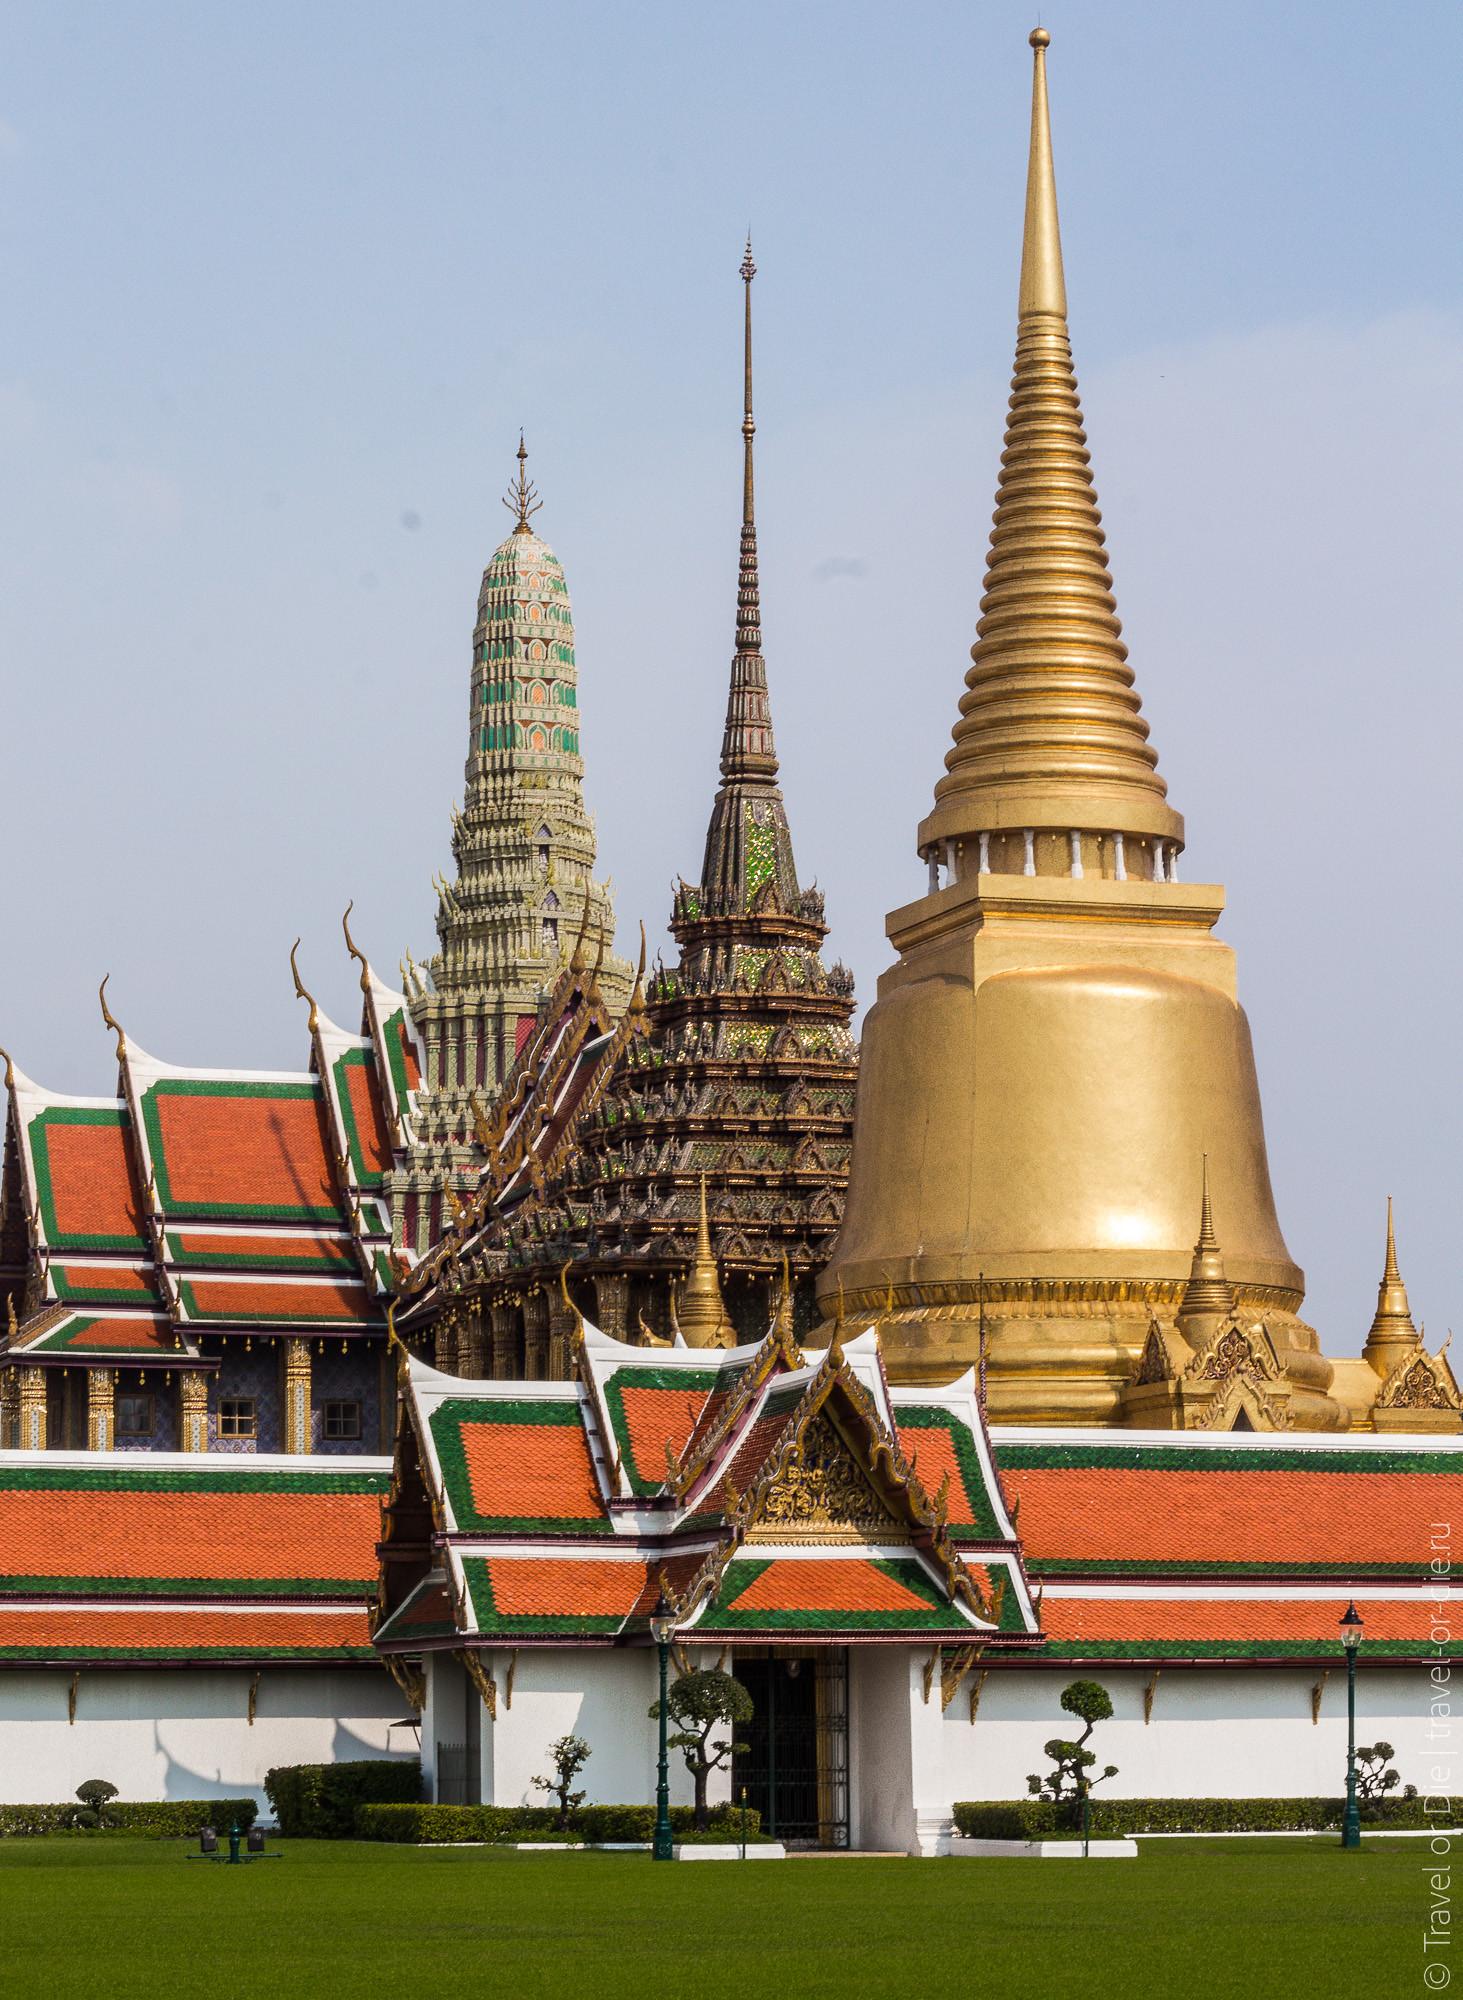 Grand-Palace-Bangkok-Королевский-дворец-Бангкок-9307